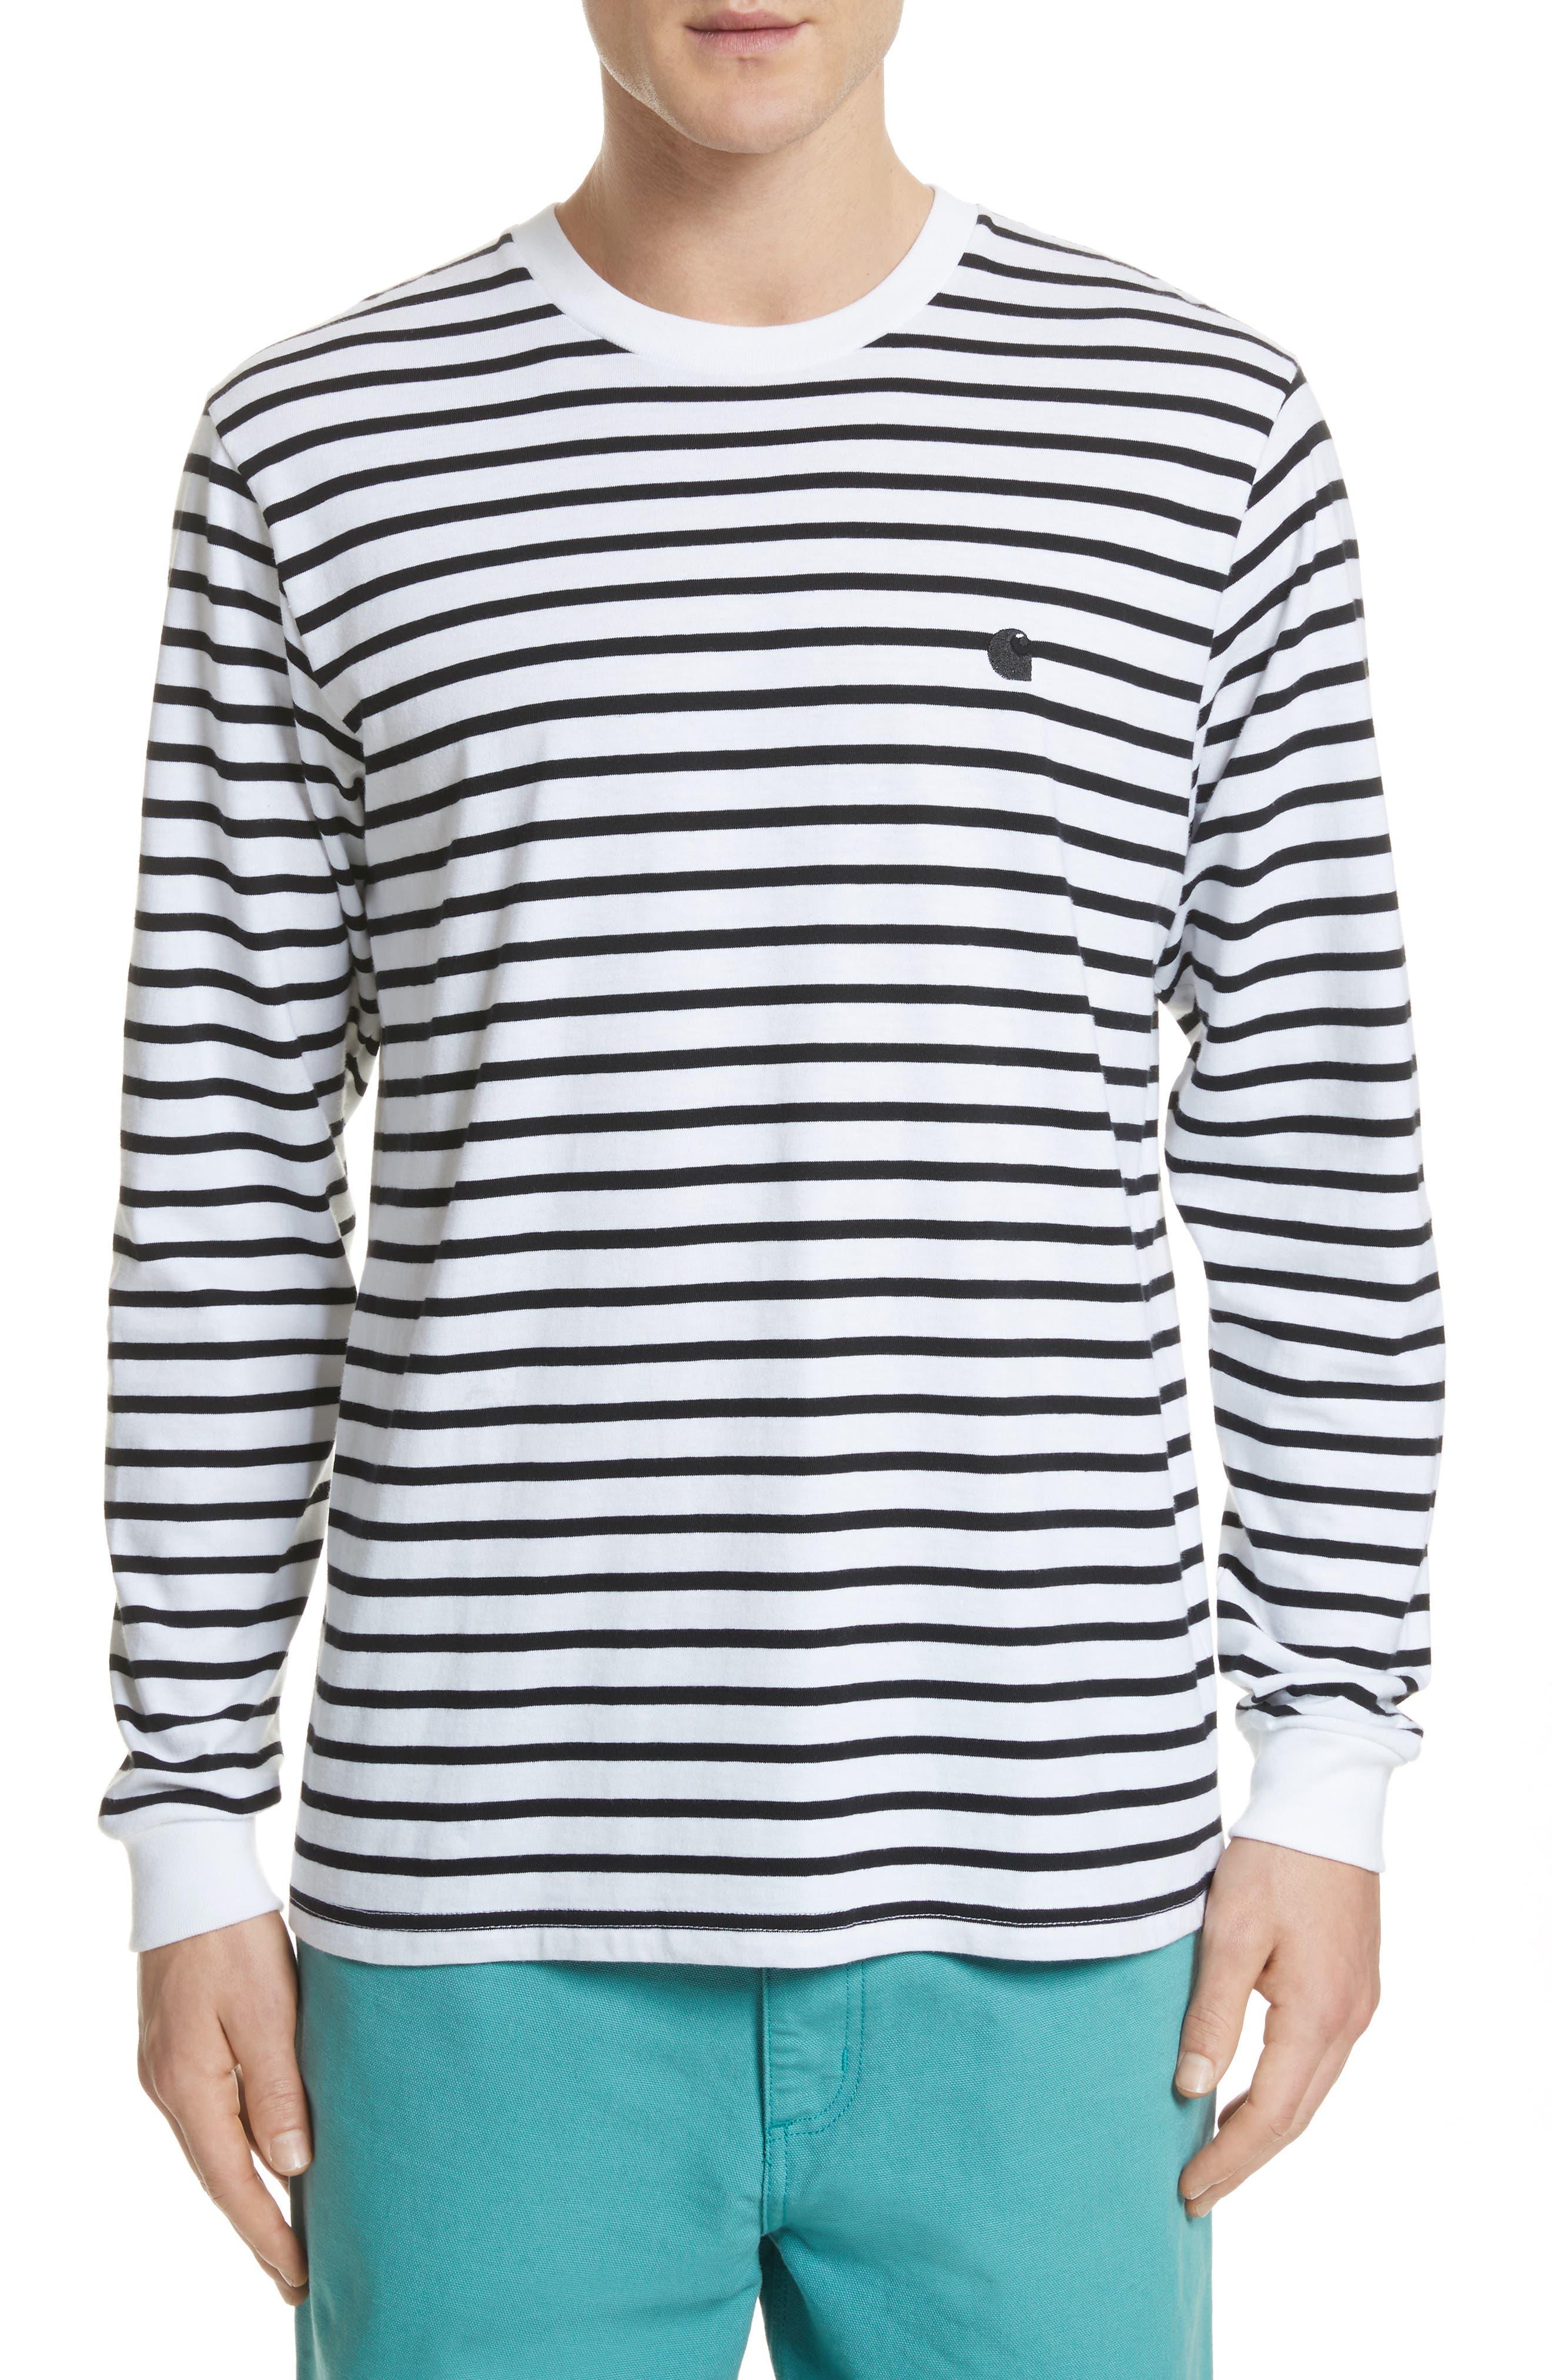 Alternate Image 1 Selected - Carhartt Work in Progress Stripe Long Sleeve T-Shirt